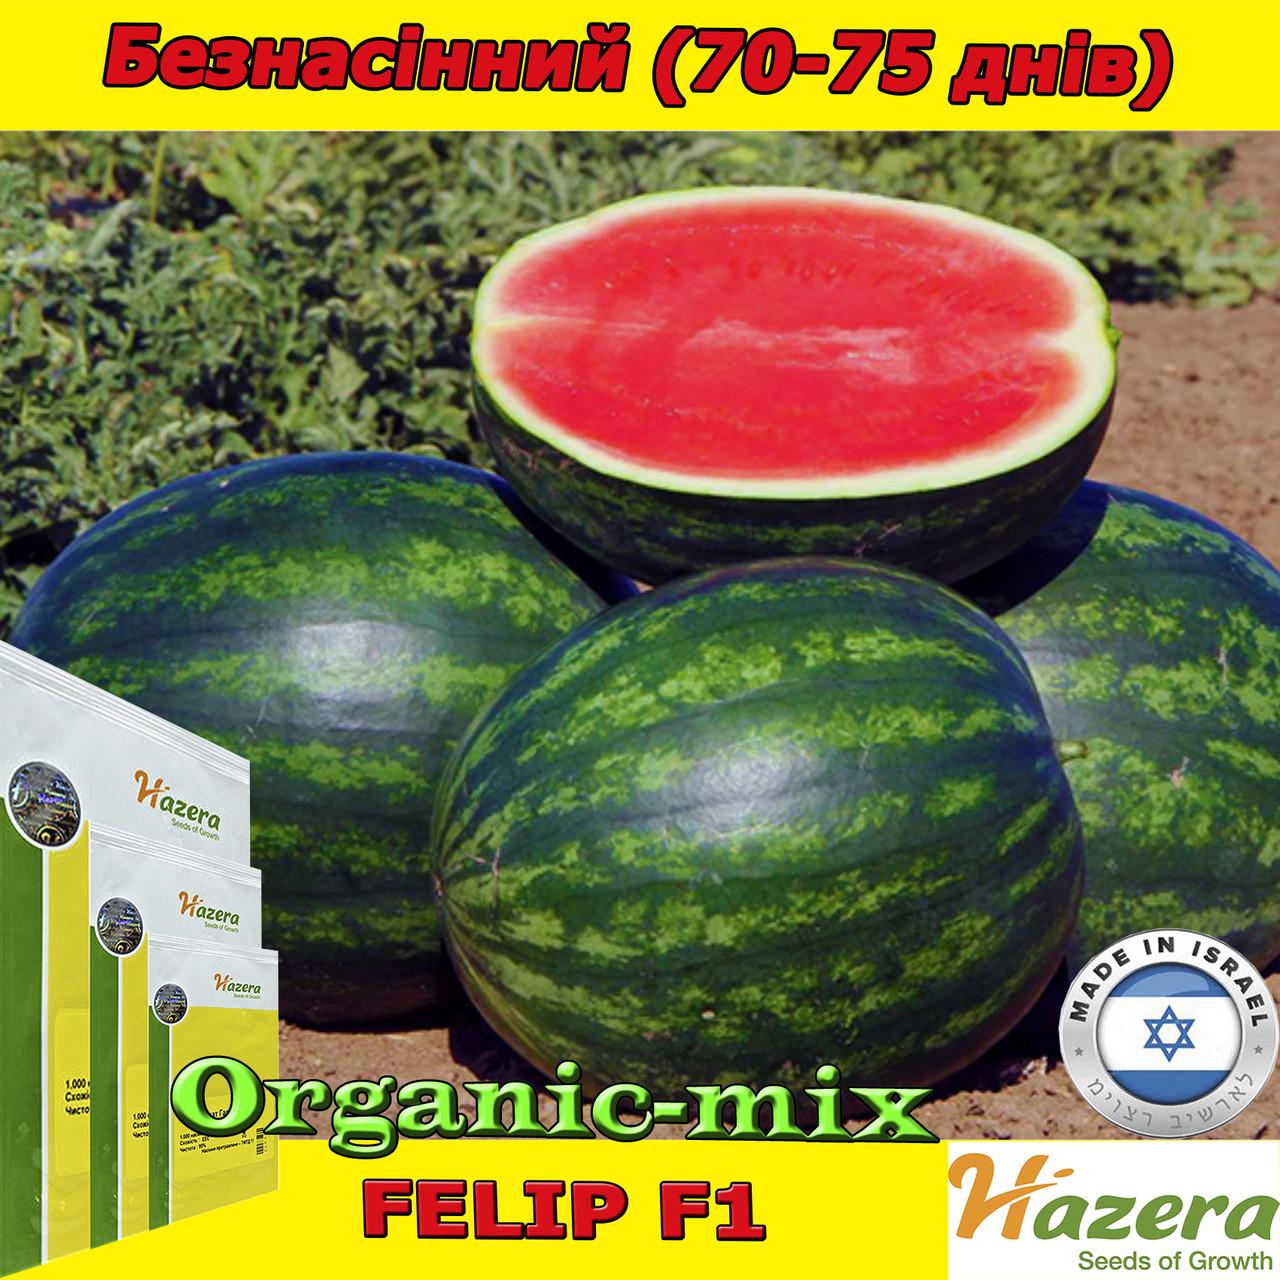 Семена, арбуз бессемянный, Фелип F1, ТМ Нazera (Израиль) проф. пакет 500 семян